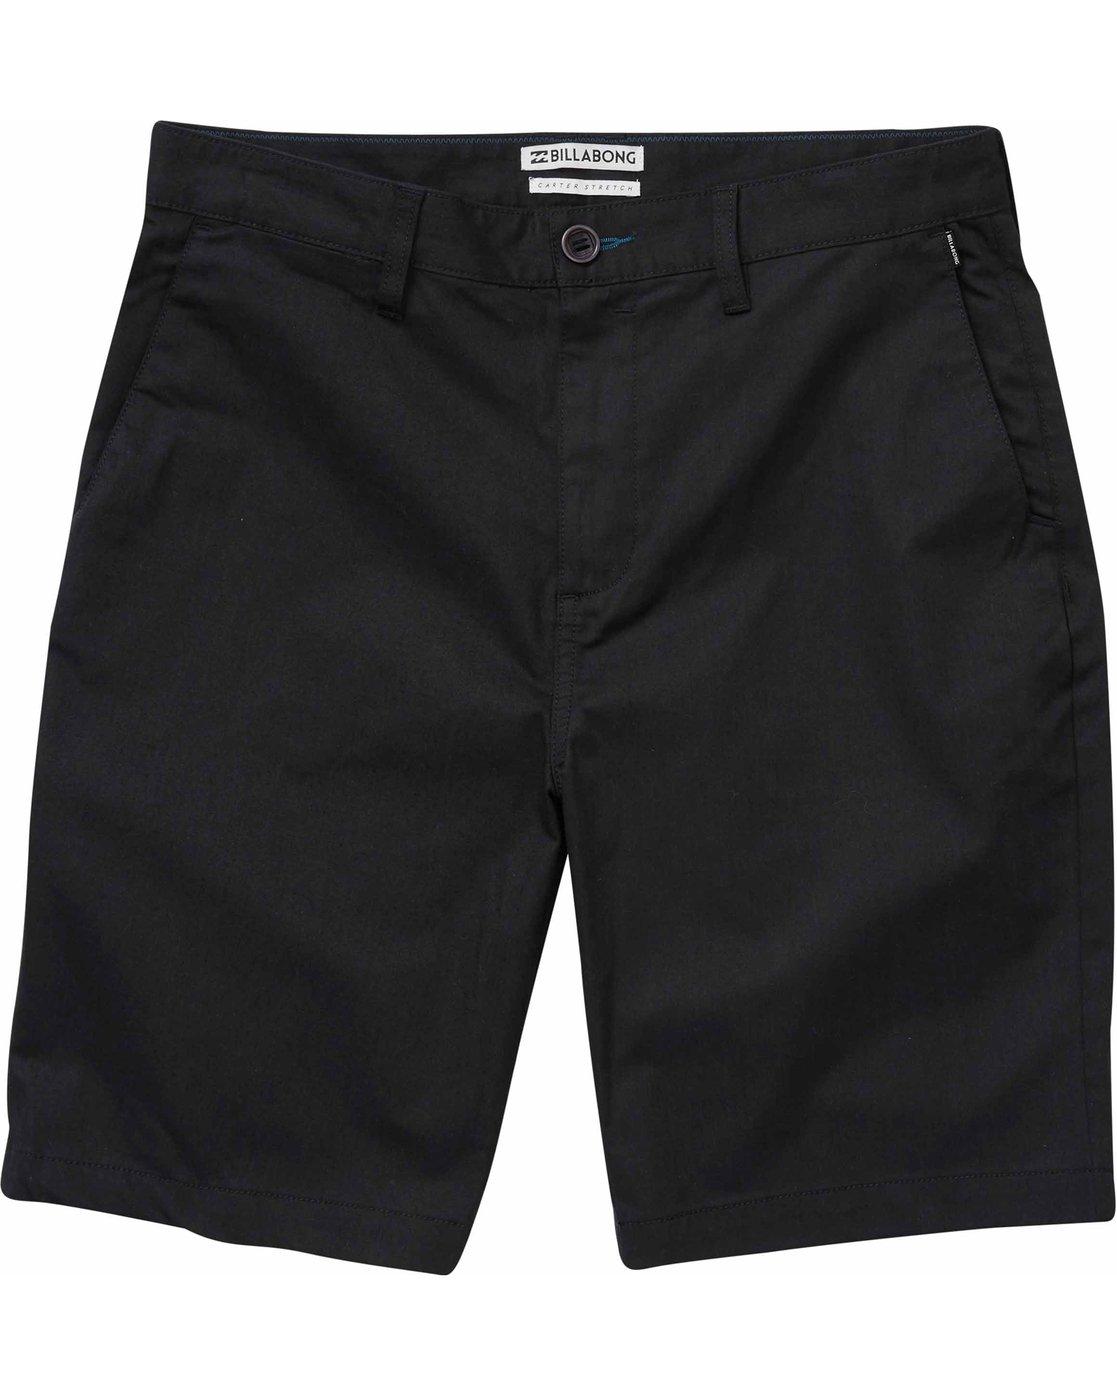 8c5933702b 0 Carter Stretch Shorts Black M231NBCS Billabong